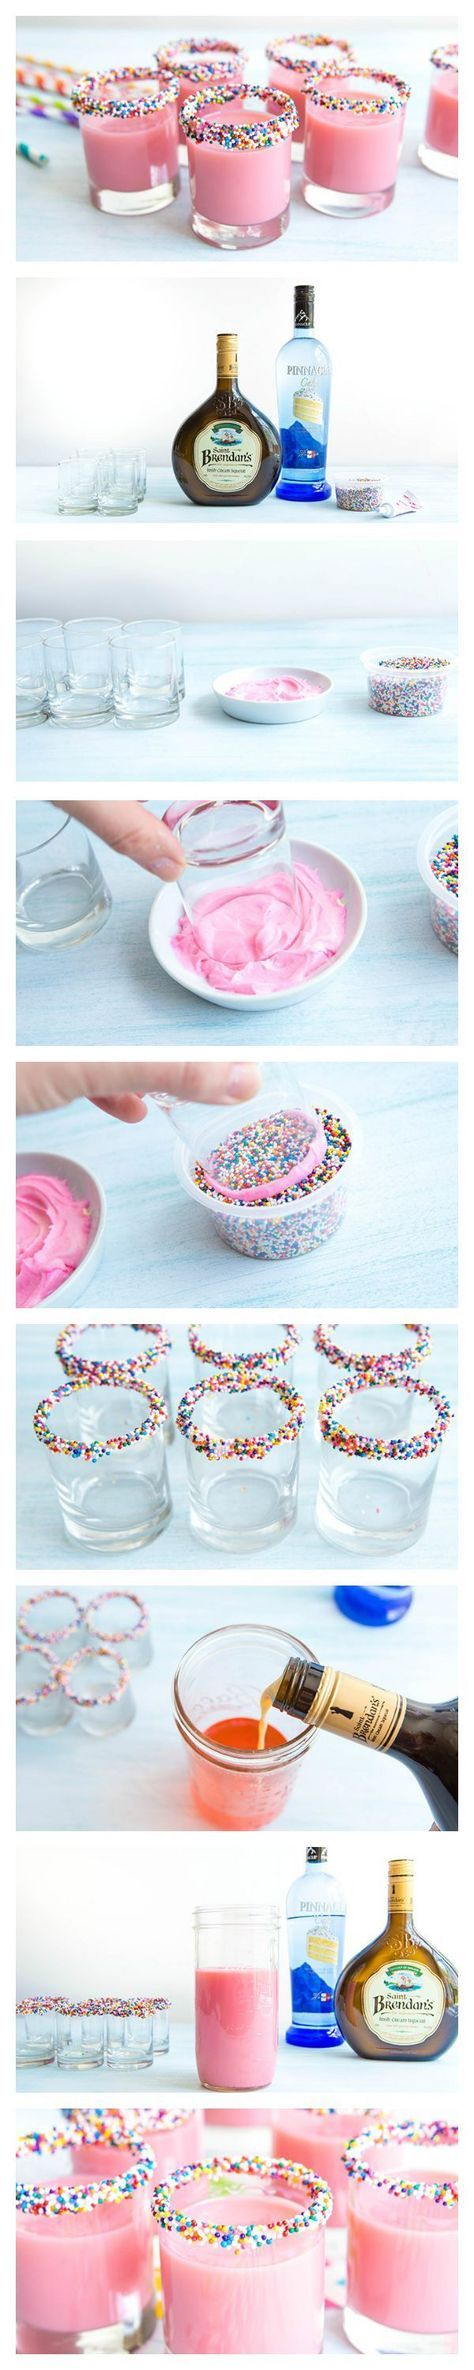 Birthday Cake Shots Recipe Bright pink Birthday cakes and